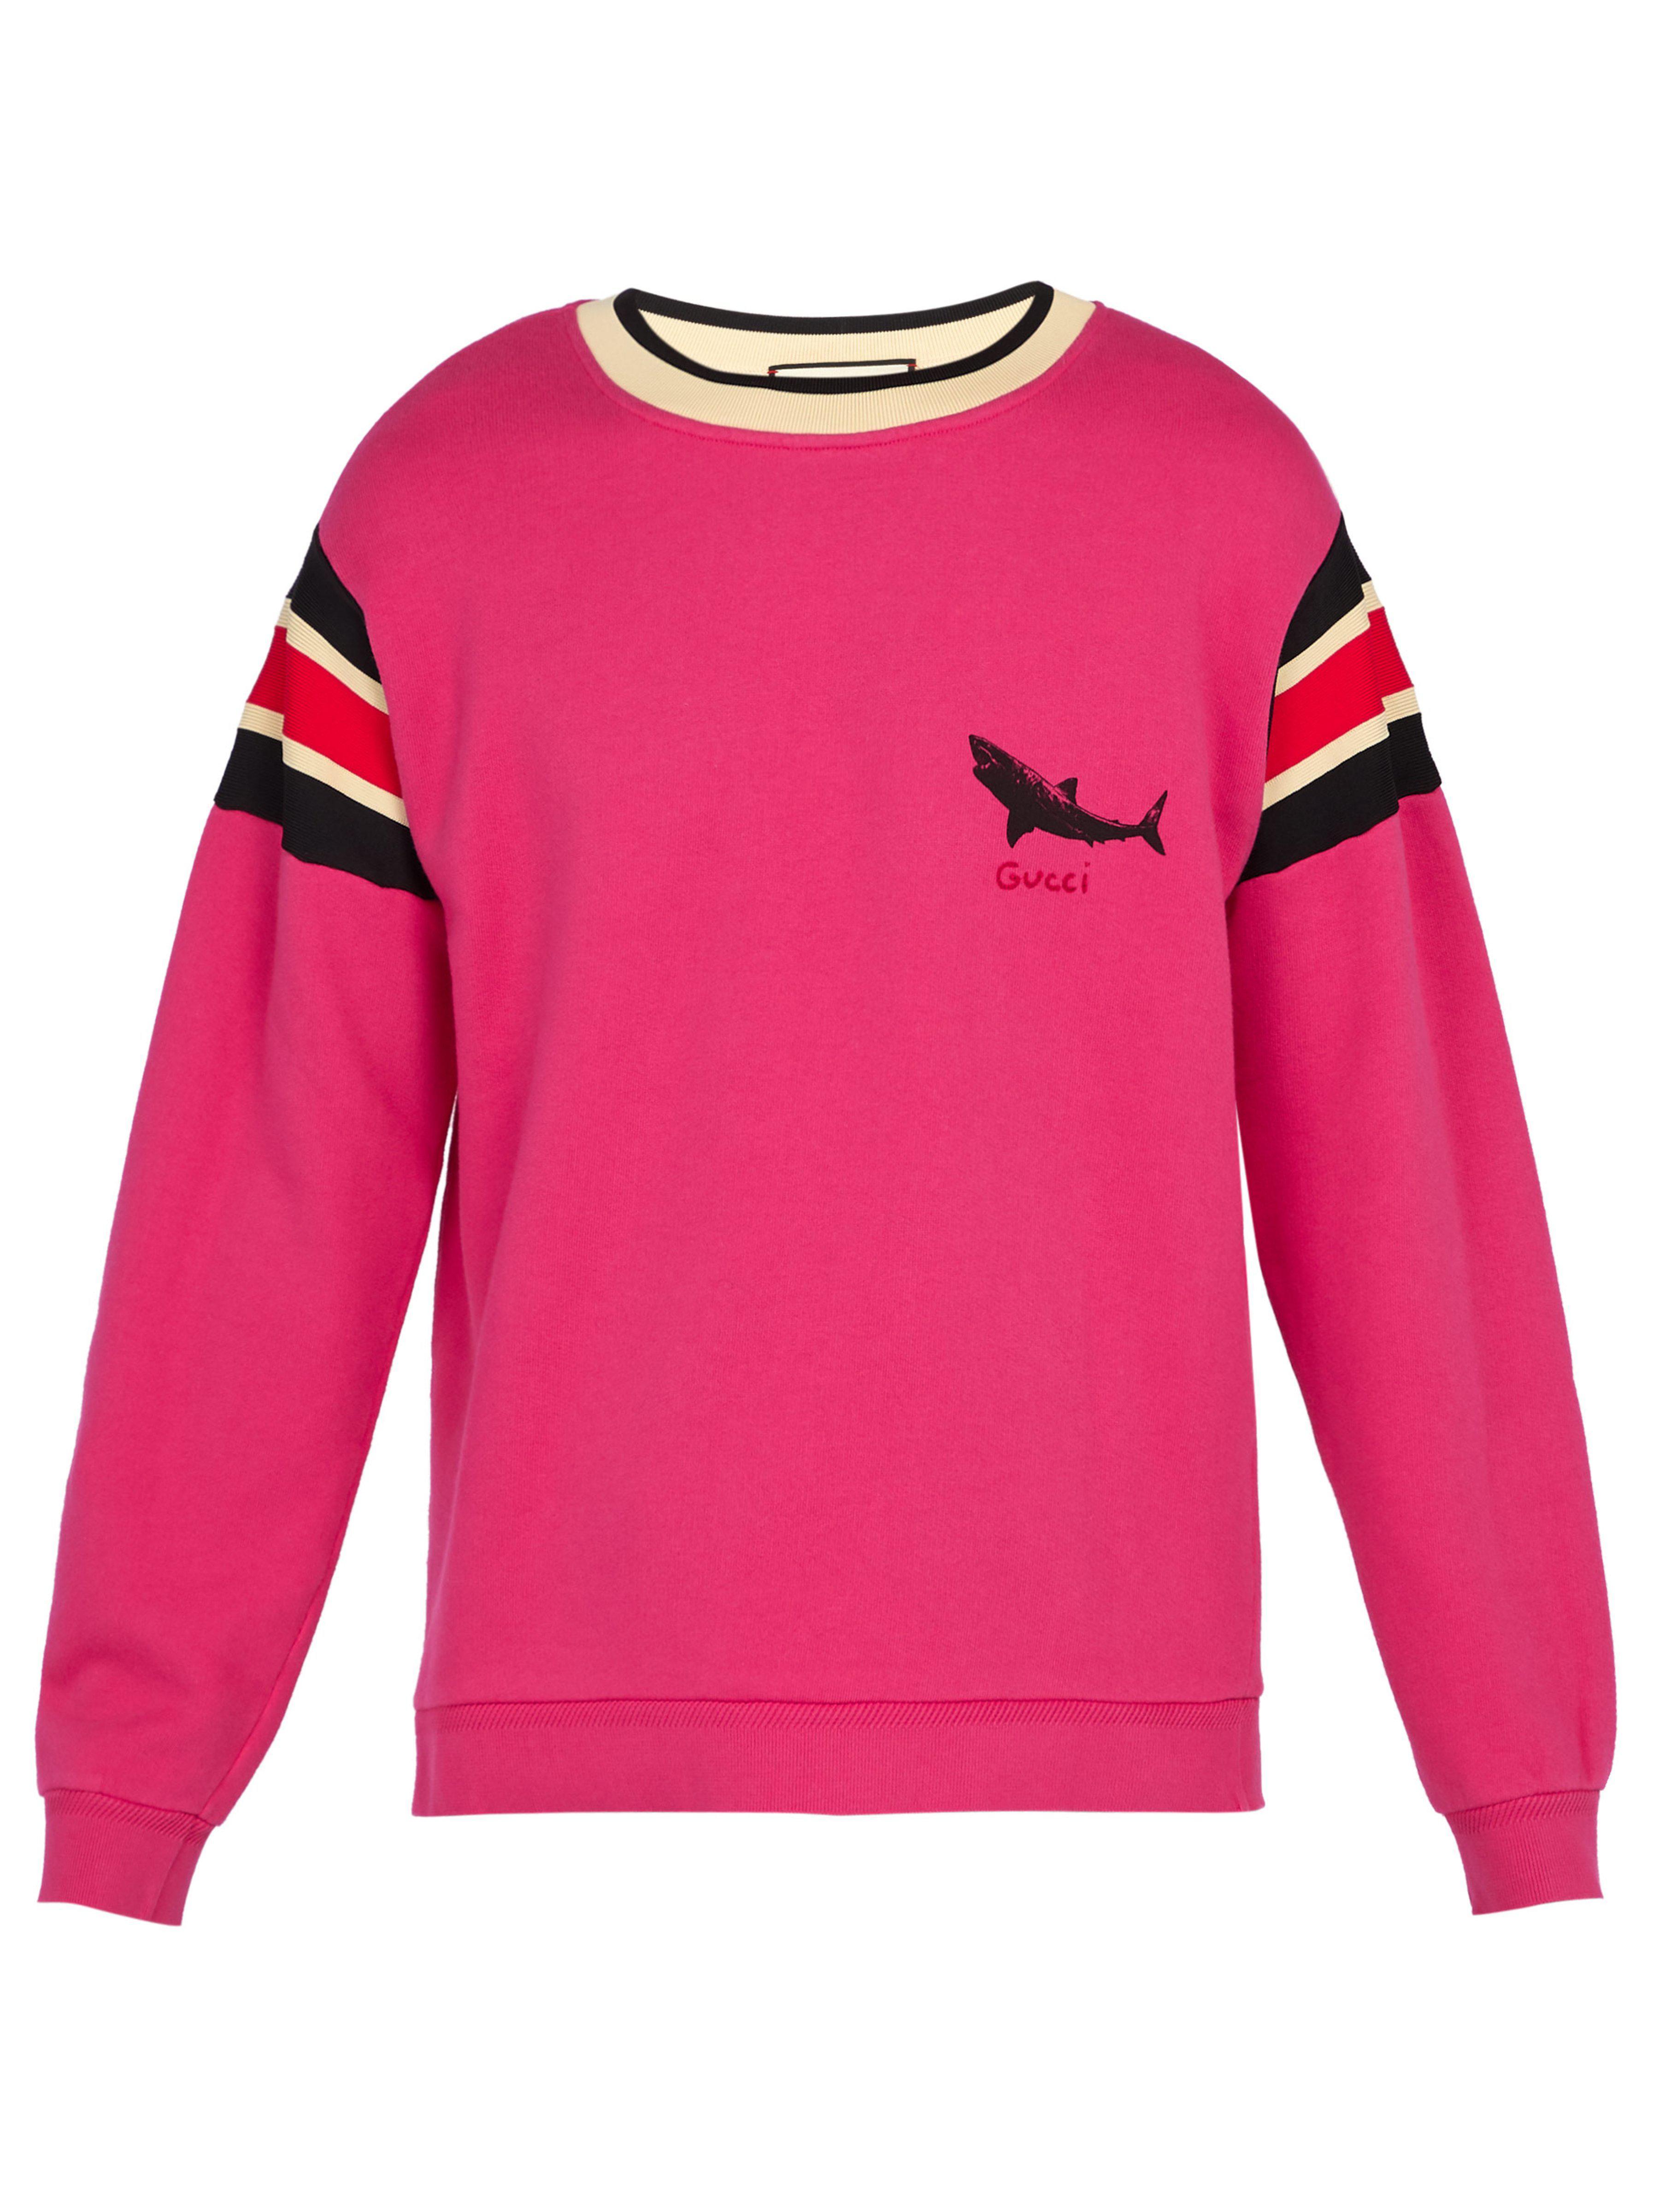 42cafdaf2f0 Gucci - Pink Shark Print Cotton Sweatshirt for Men - Lyst. View fullscreen